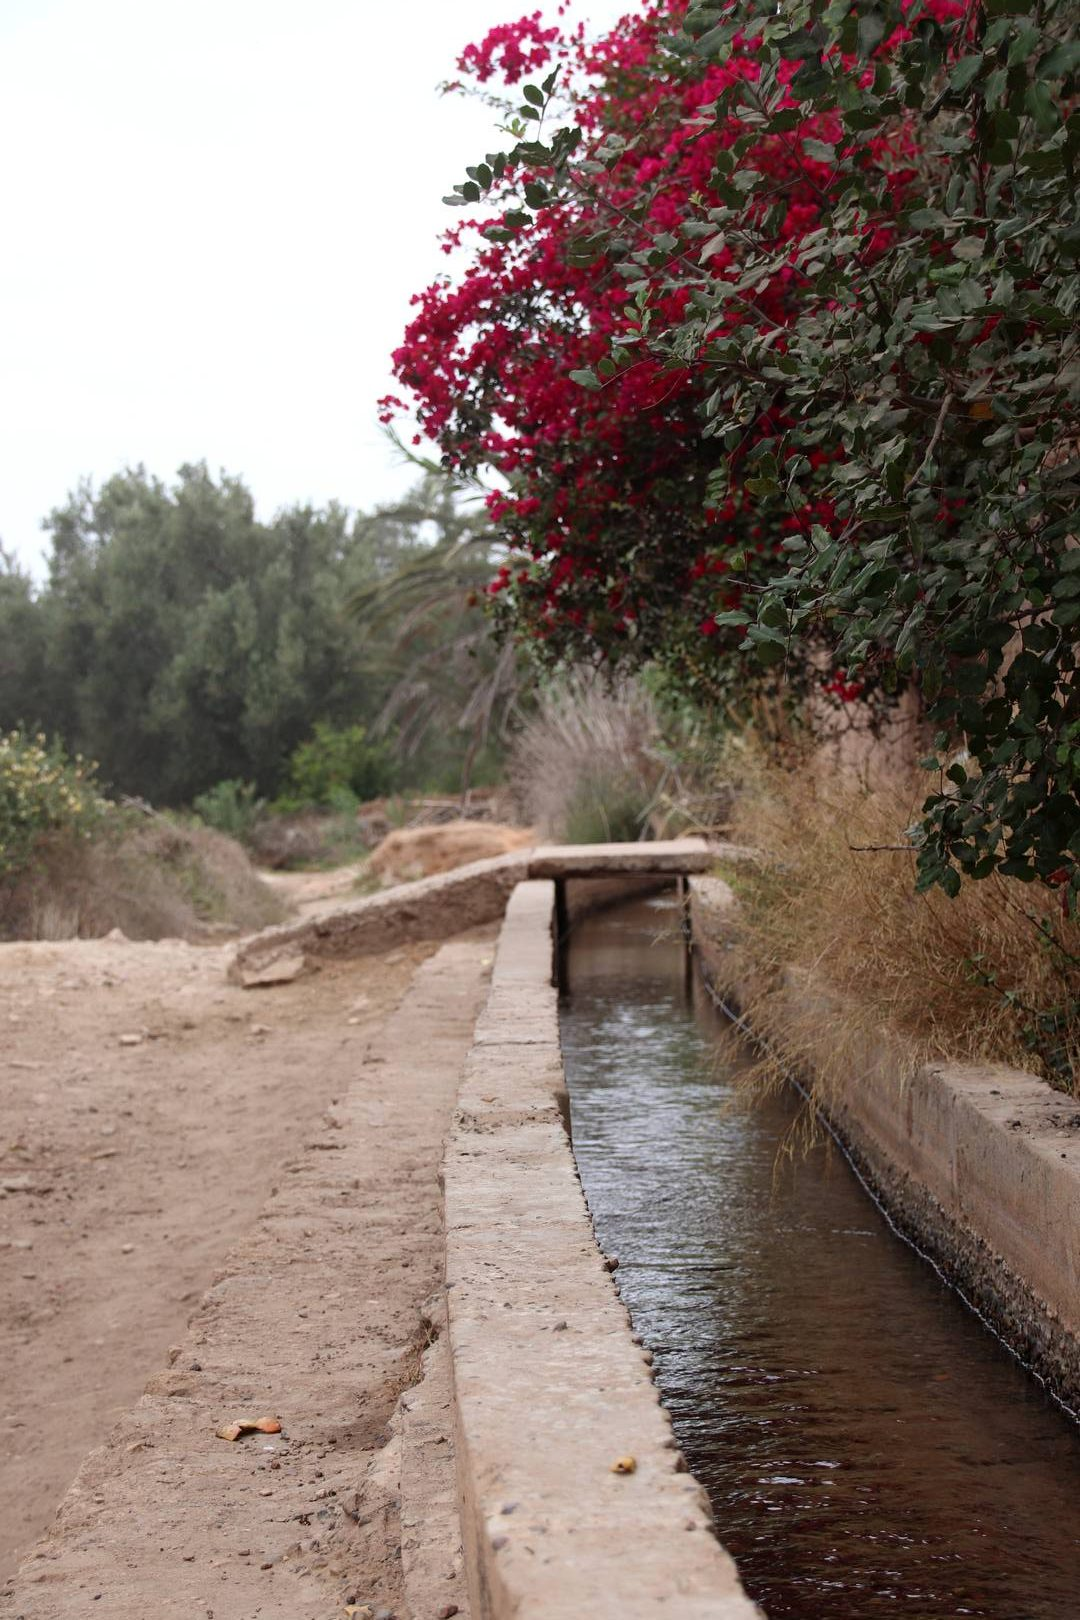 Maroc - Canal d'irrigation de l'oasis Ain Lahdjar à côté d'Essaouira